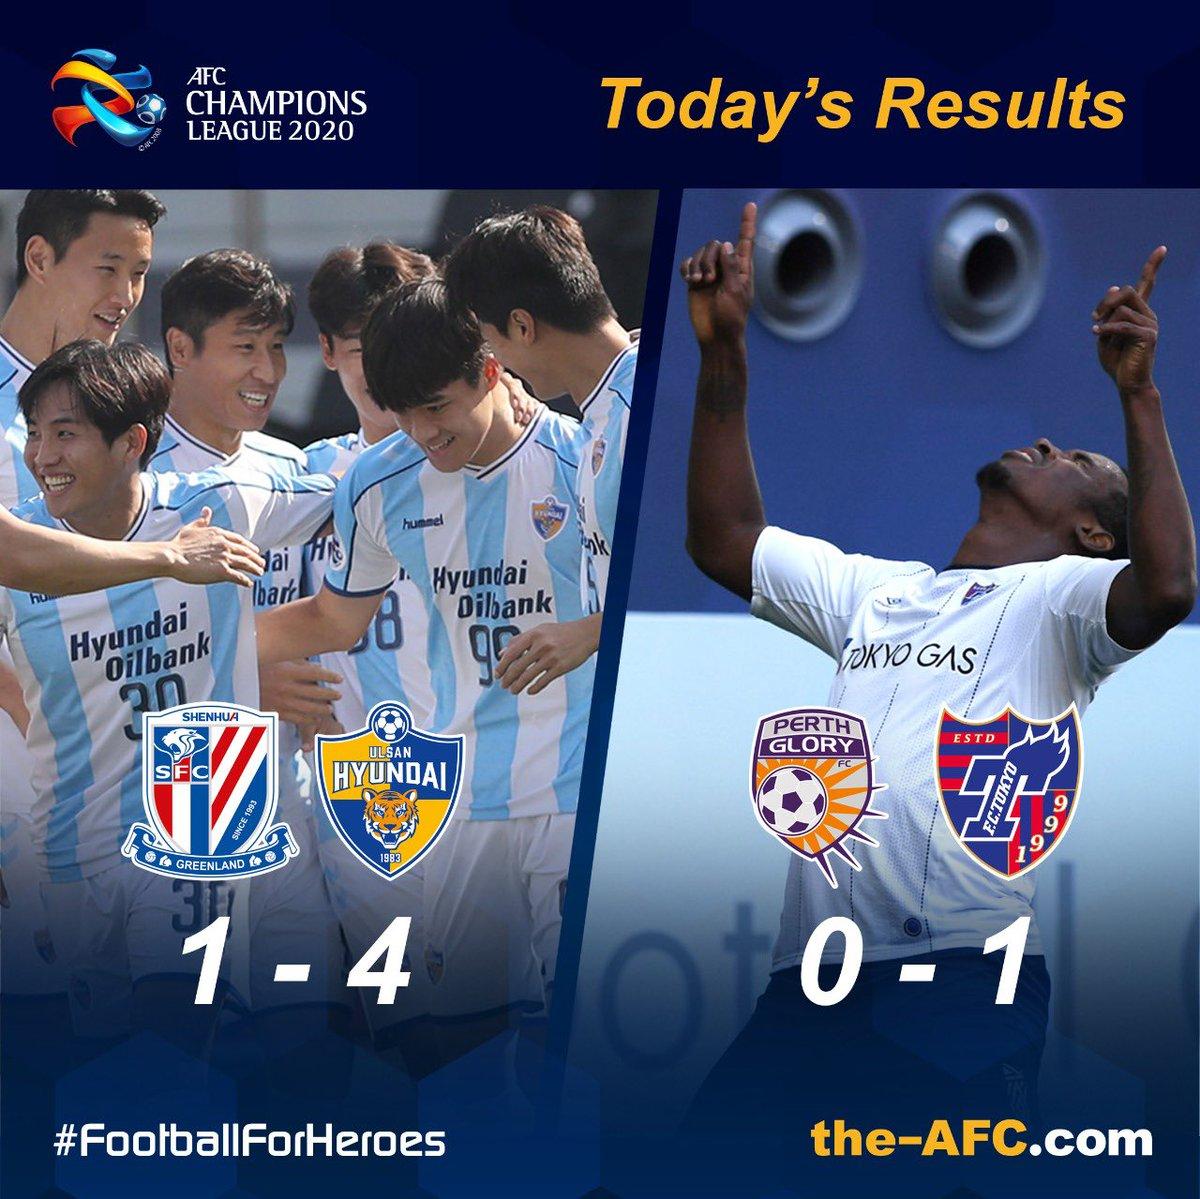 ⚽️ #ACL2020 East   Today's Results  🇨🇳 Shanghai Shenhua 1-4 Ulsan Hyundai 🇰🇷   🇦🇺 Perth Glory 0-1 FC Tokyo 🇯🇵   #FootballForHeroes